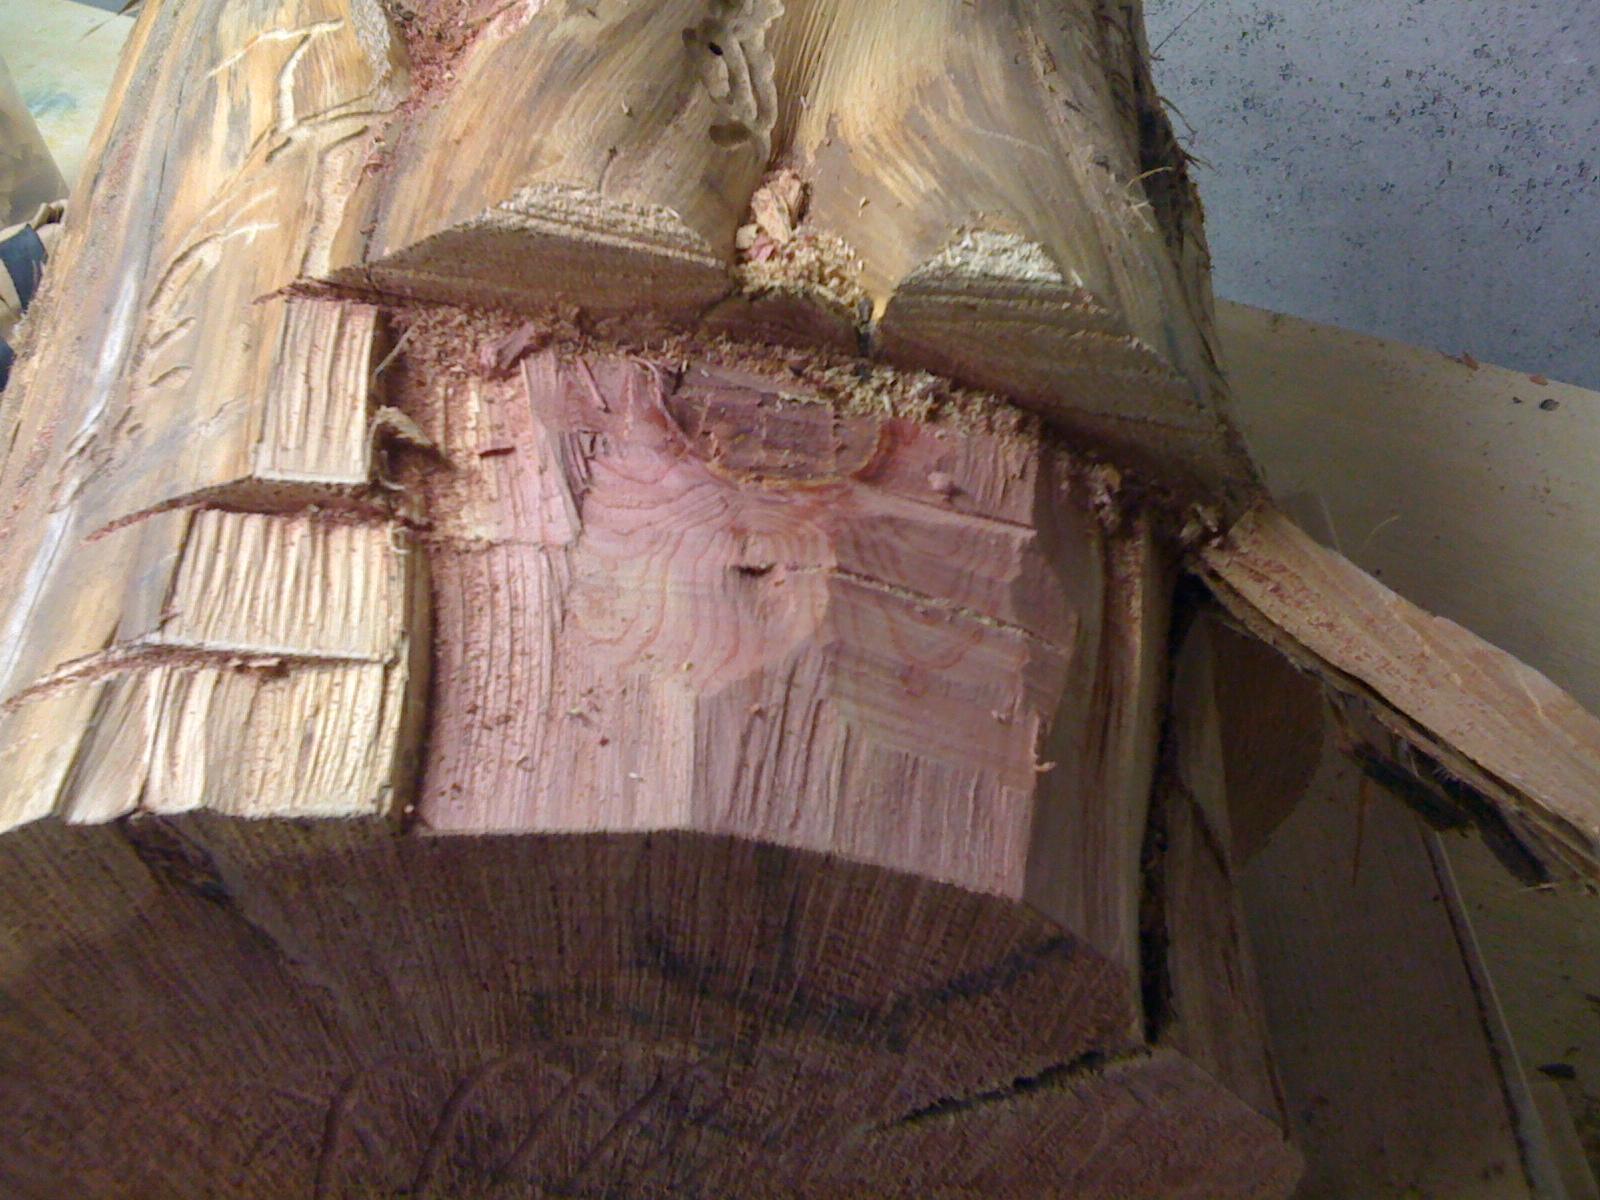 Section of cedar log